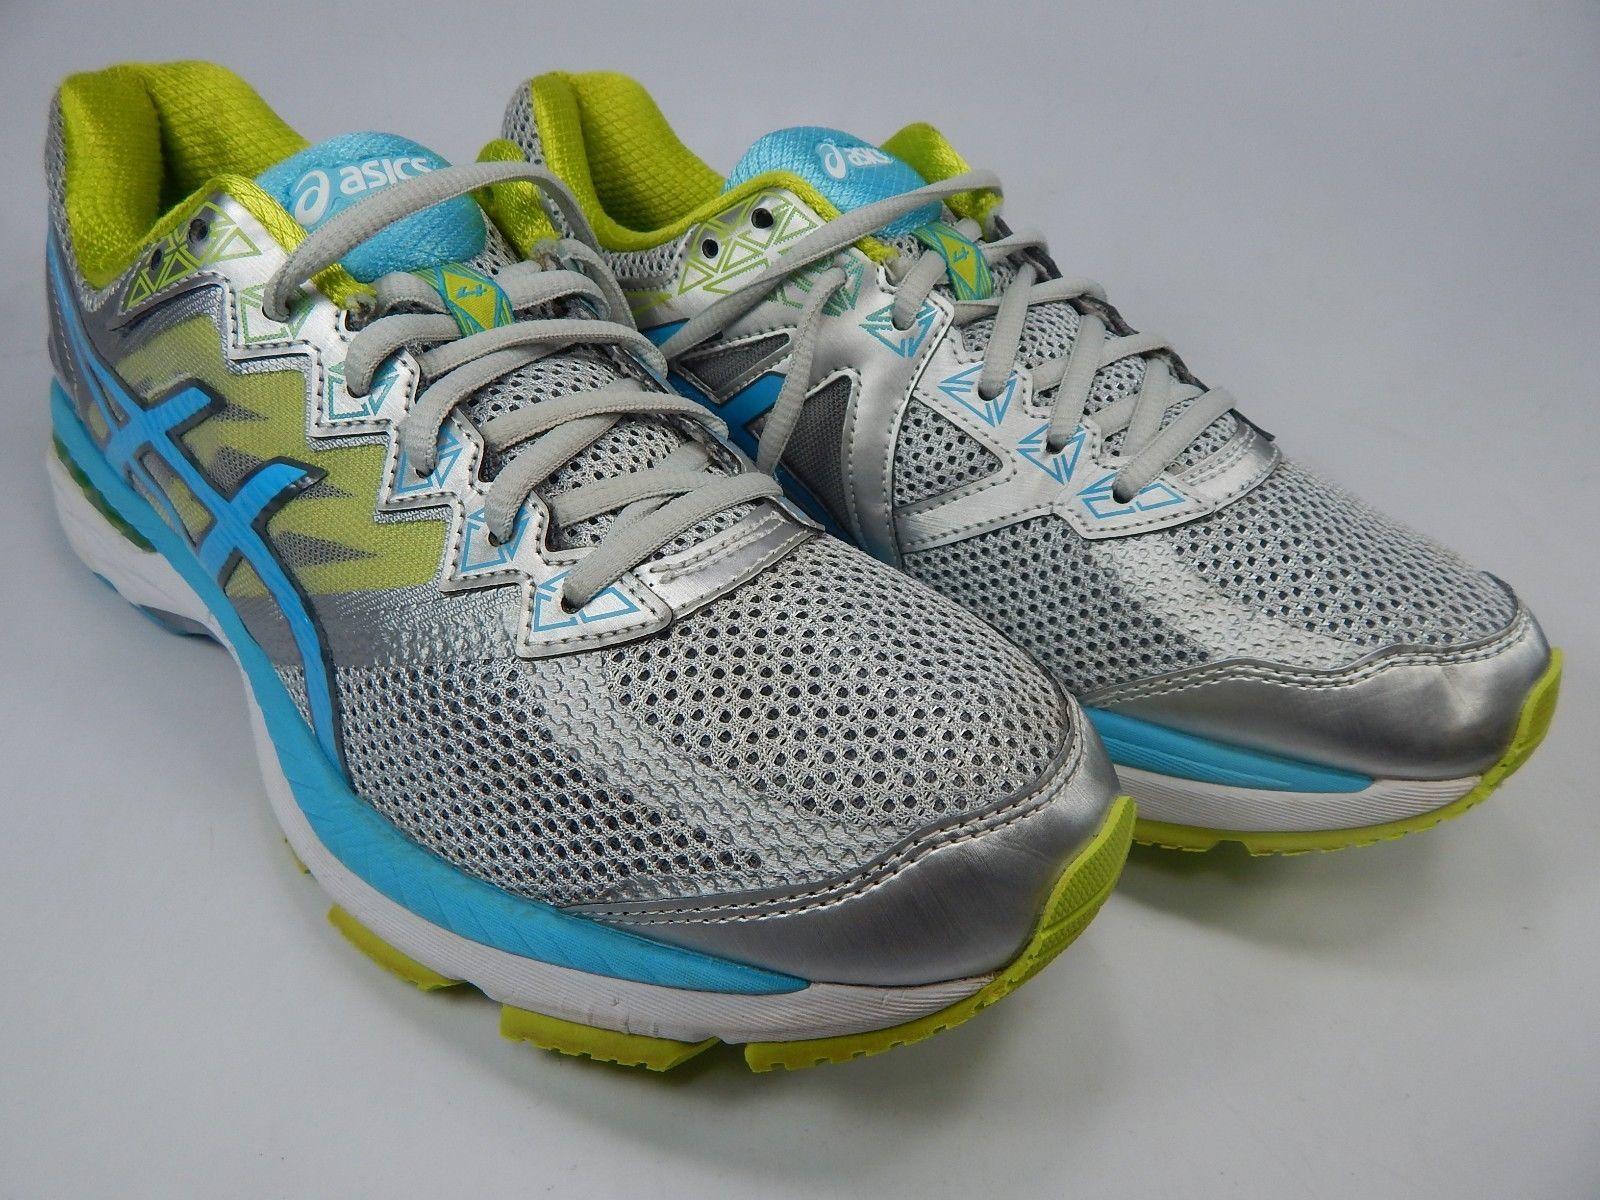 Asics GT 2000 v 4 Size US 10.5 M (B) EU 42.5 Women's Running Shoes Silver T656N